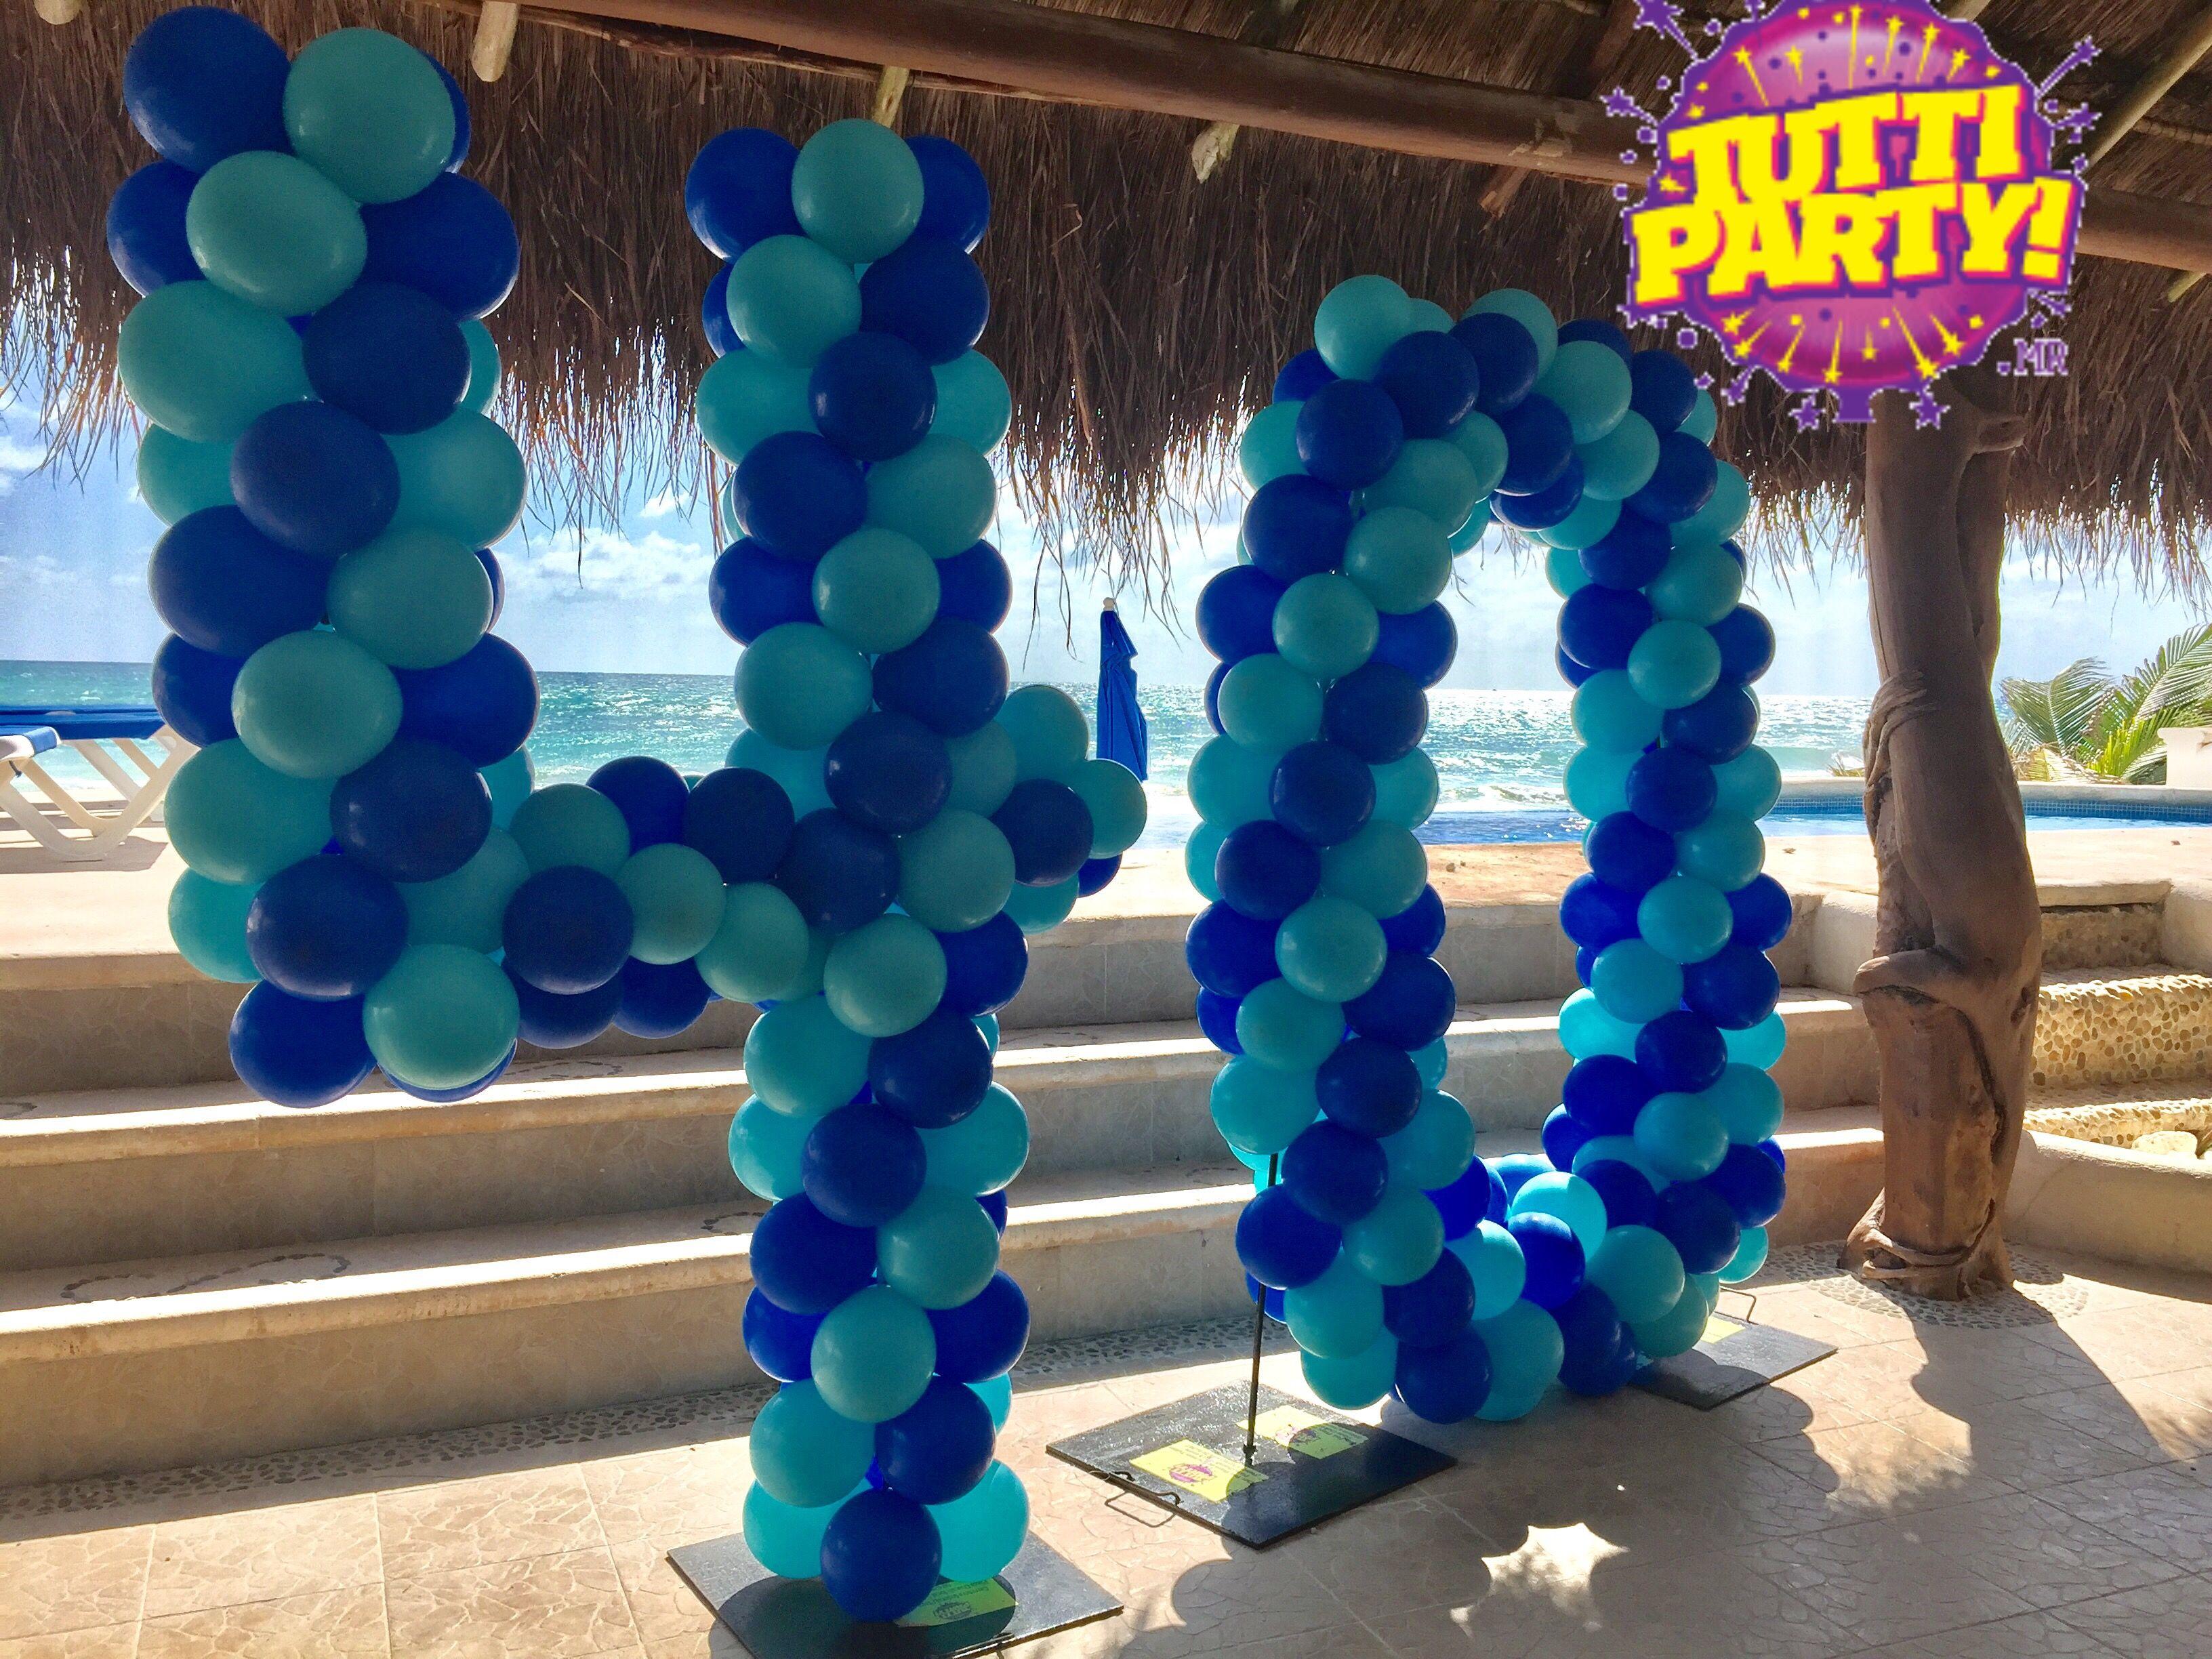 pinteresurhpinterestcom ball suzy decor beach call party luau ideas birthday share u favorite cream your sundae ice diy rhpinterestcom decorations us